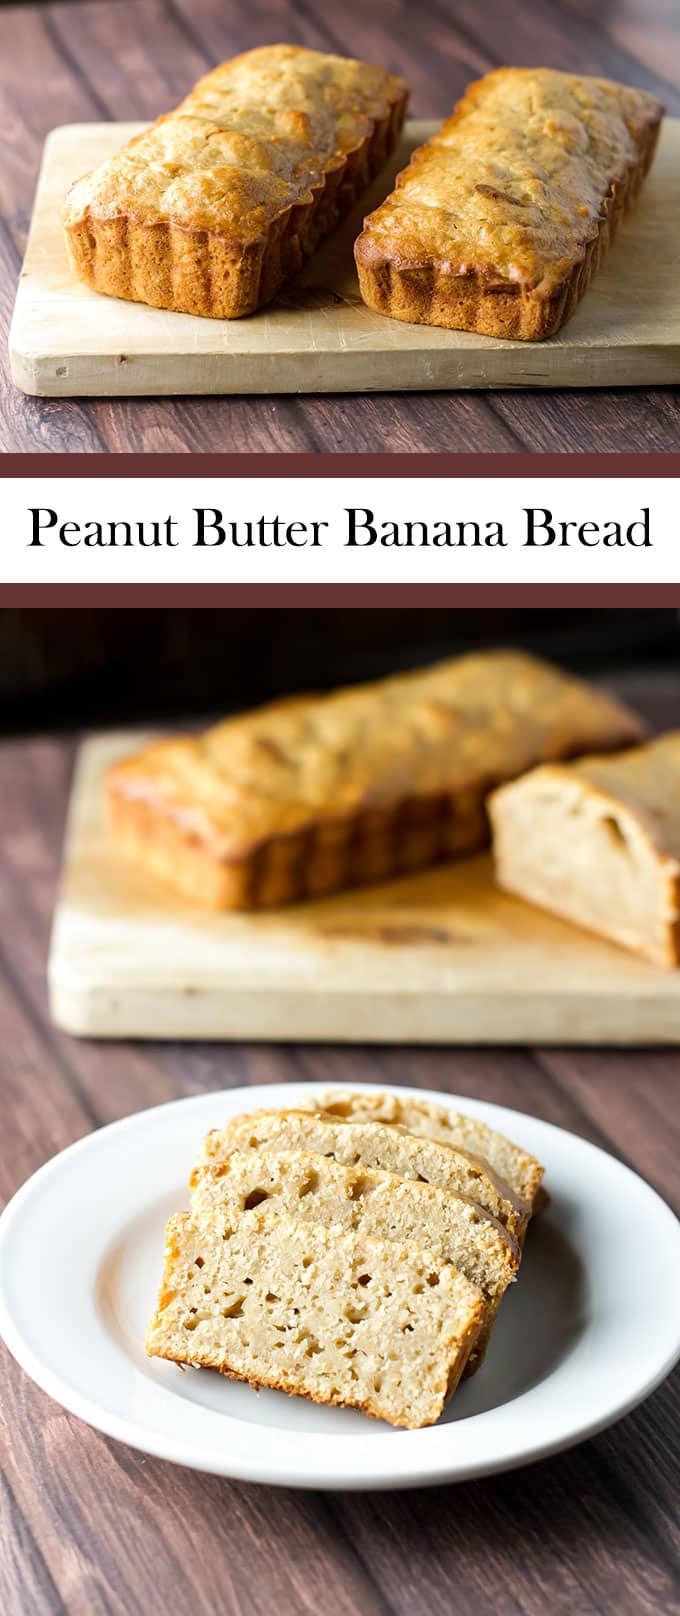 Peanut Butter Banana Bread | girlgonegourmet.com